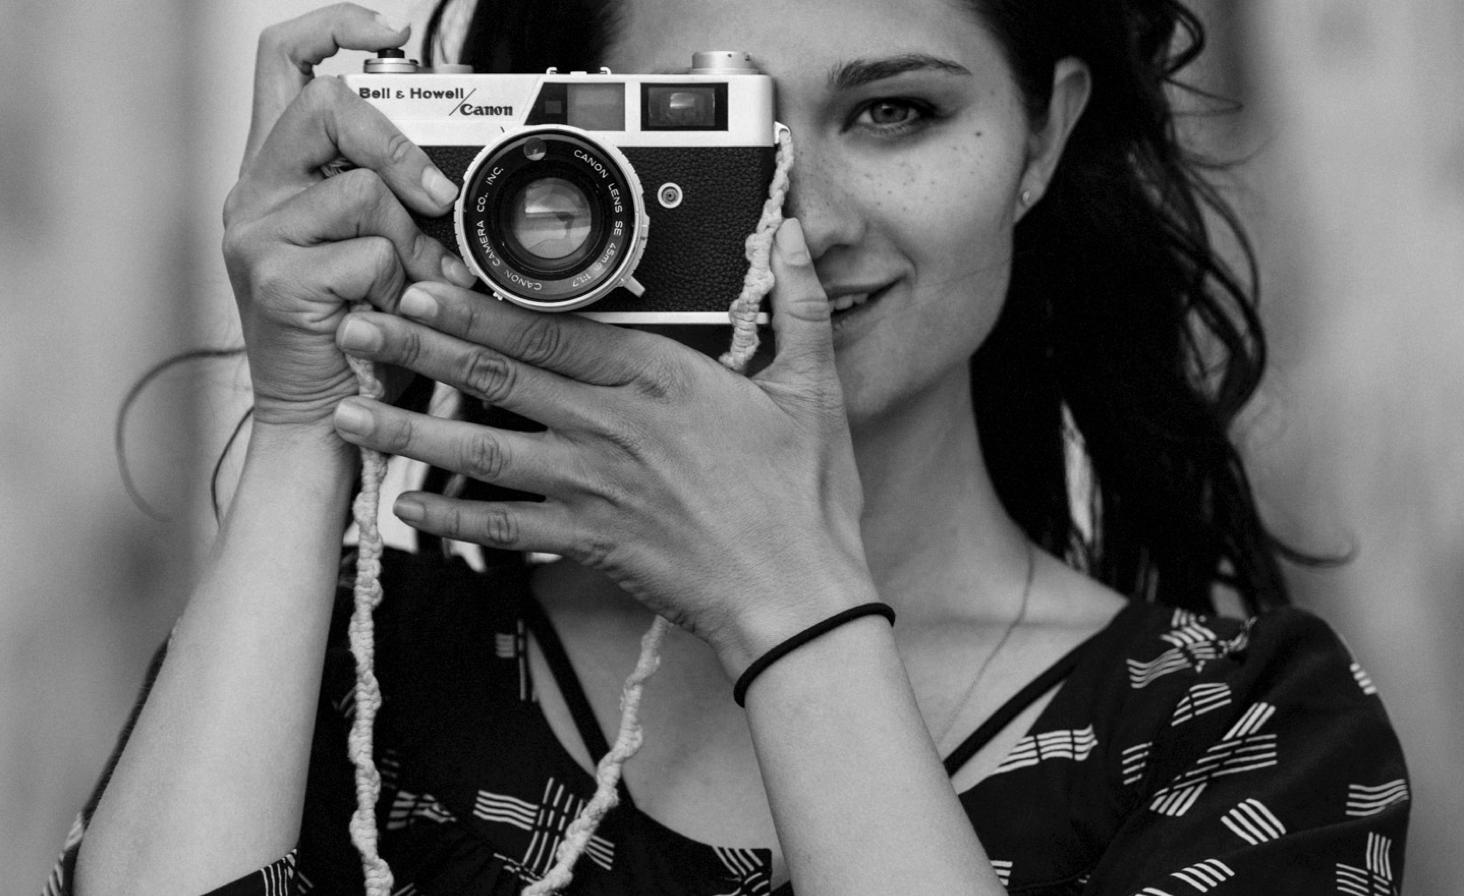 TRUE GRIT - PHOTOGRAPHER & ENVIRONMENTALIST MEG HAYWOOD SULLIVAN